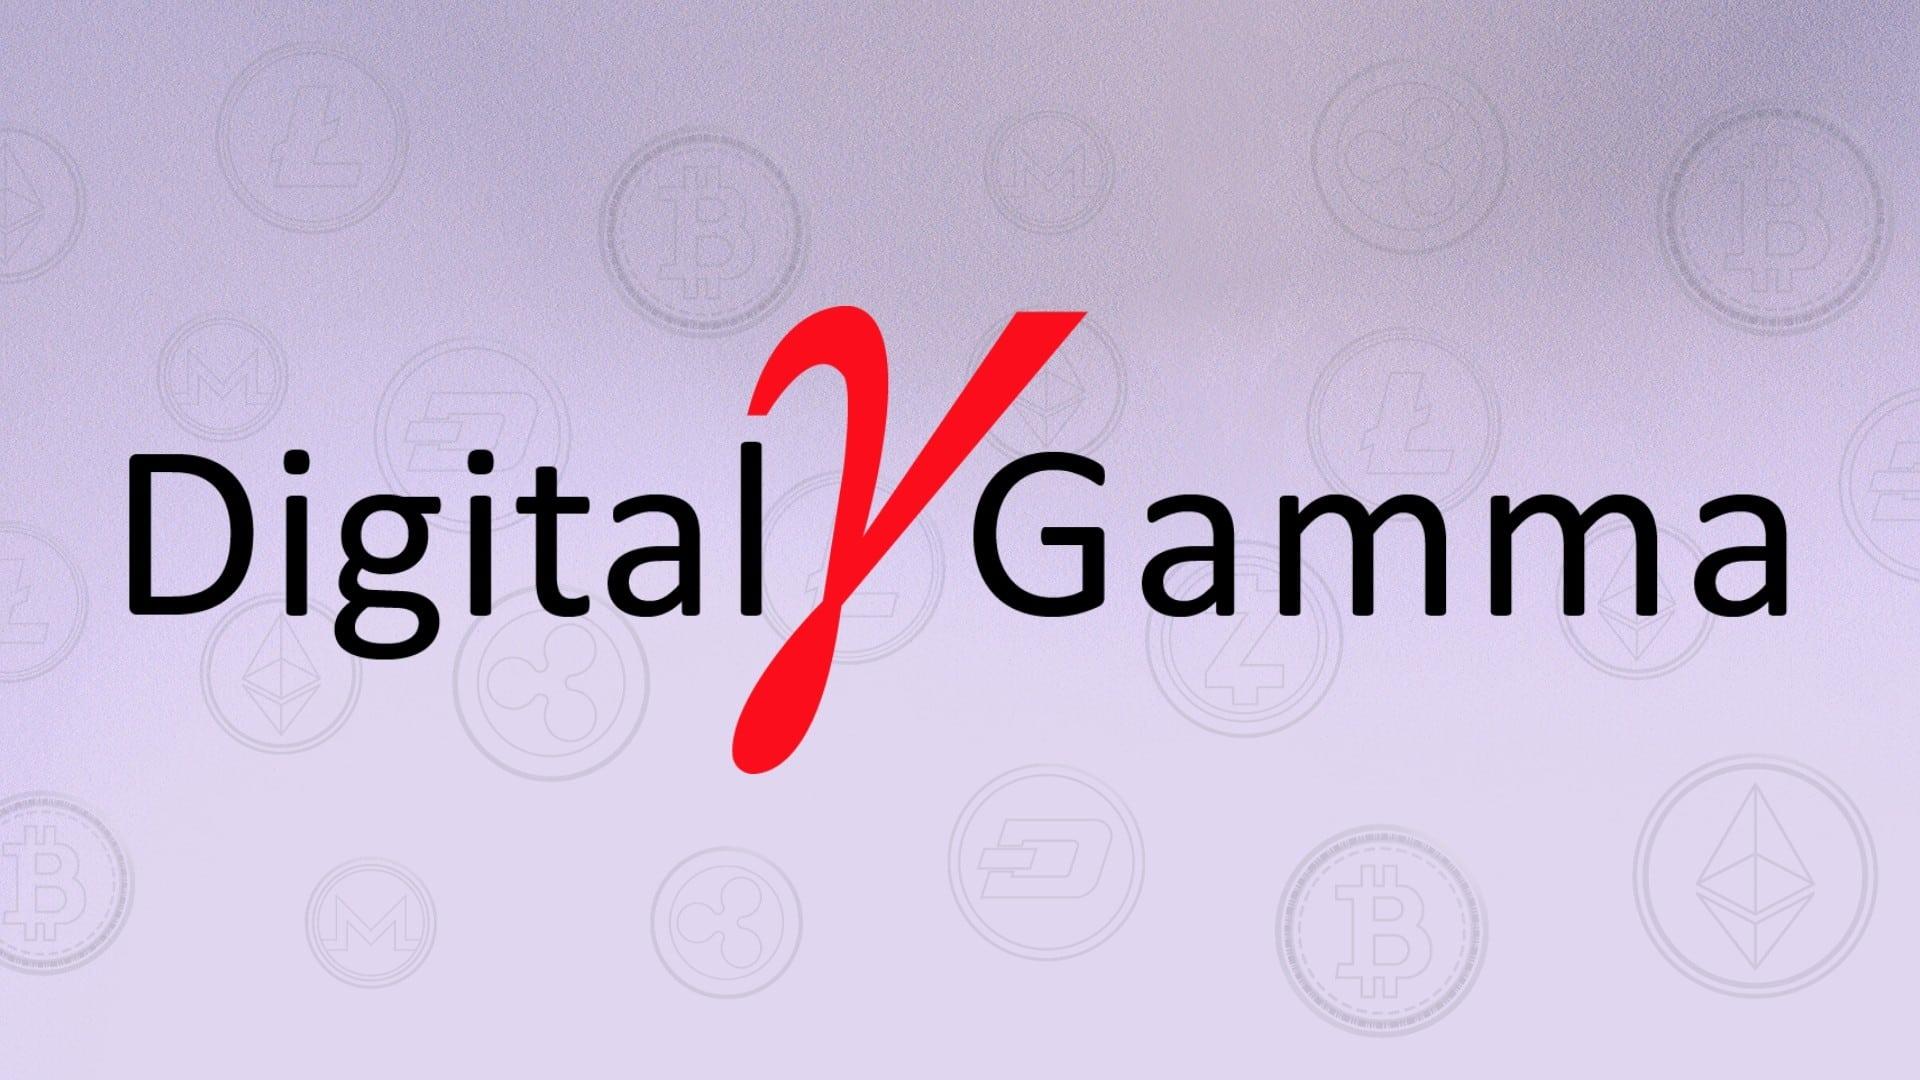 Digital Gamma Launches Tri-party Repo (TPR) Protocol for Cryptocurrencies